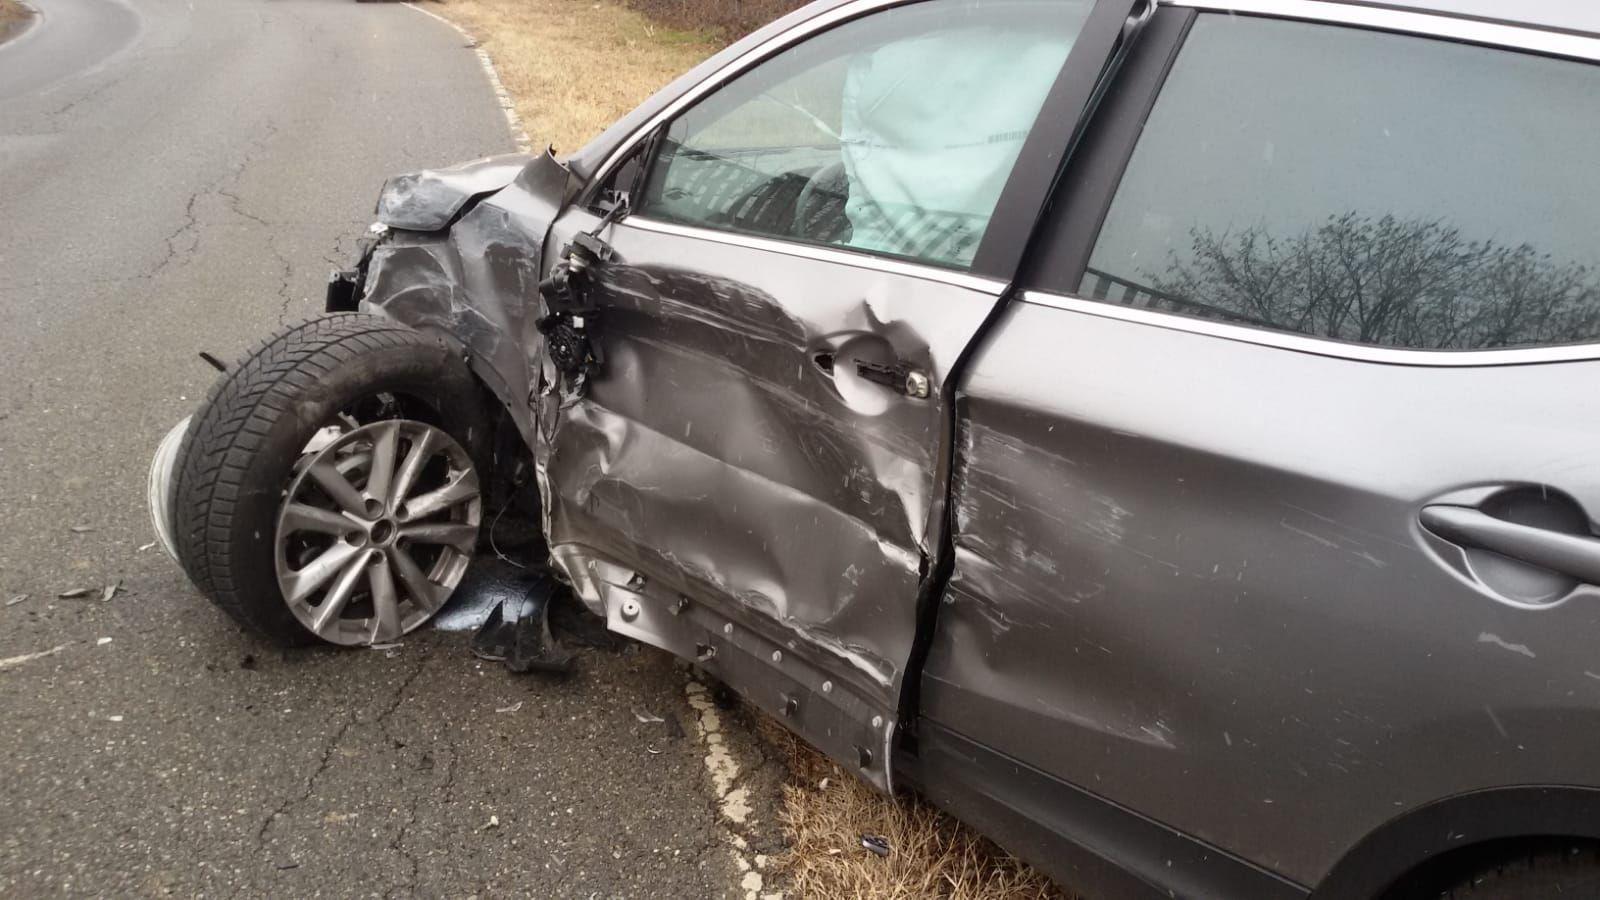 FRONT CANAVESE - Incidente sulla strada provinciale per Vauda